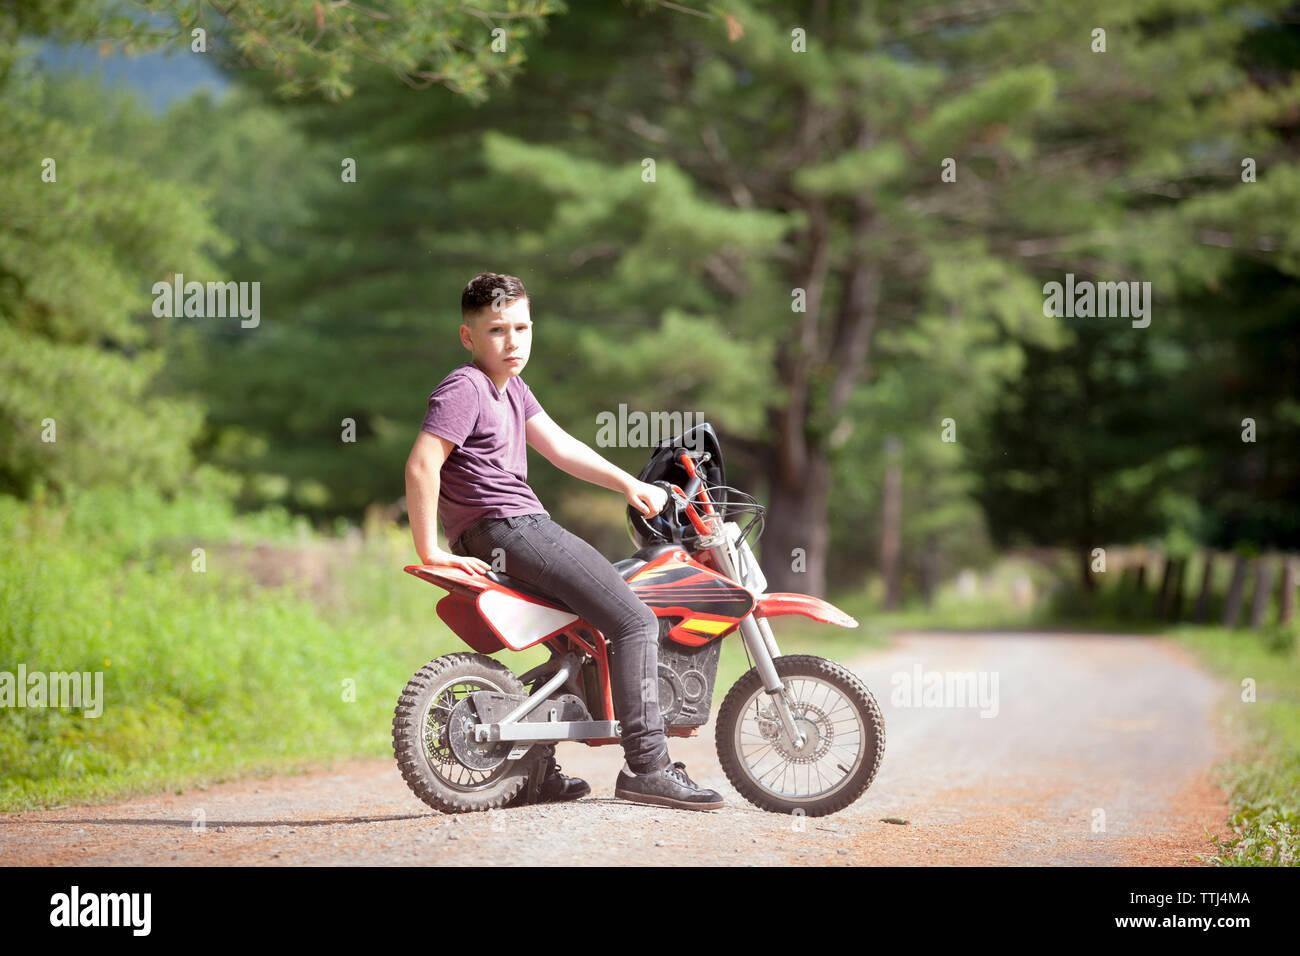 Portrait of boy sitting on dirt bike - Stock Image